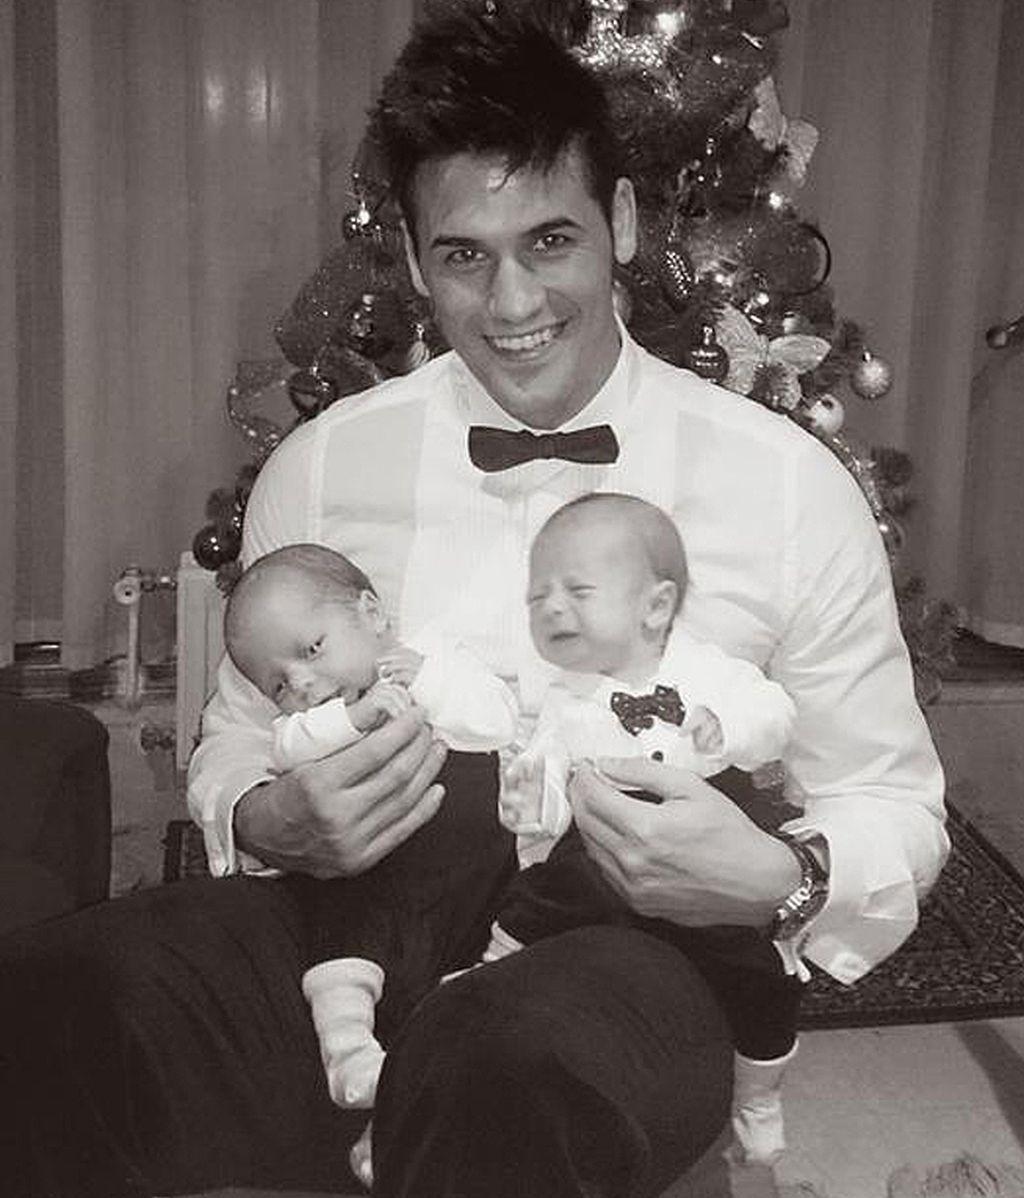 Oliver padre de gemelos